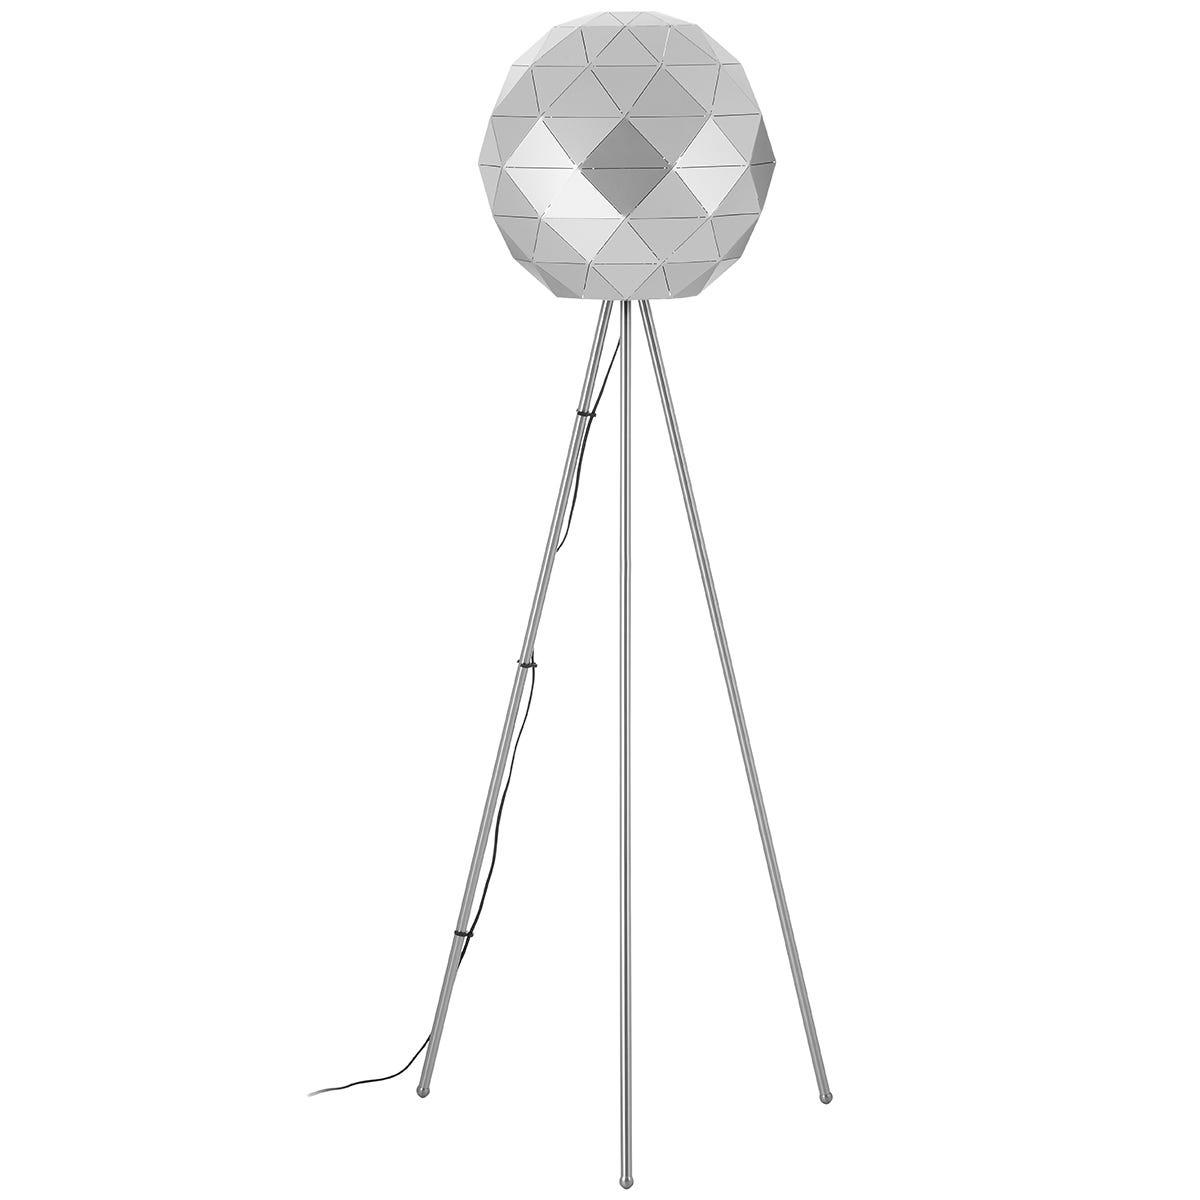 Premier Housewares Mateo Geometric Floor Lamp with Steel Base - Silver